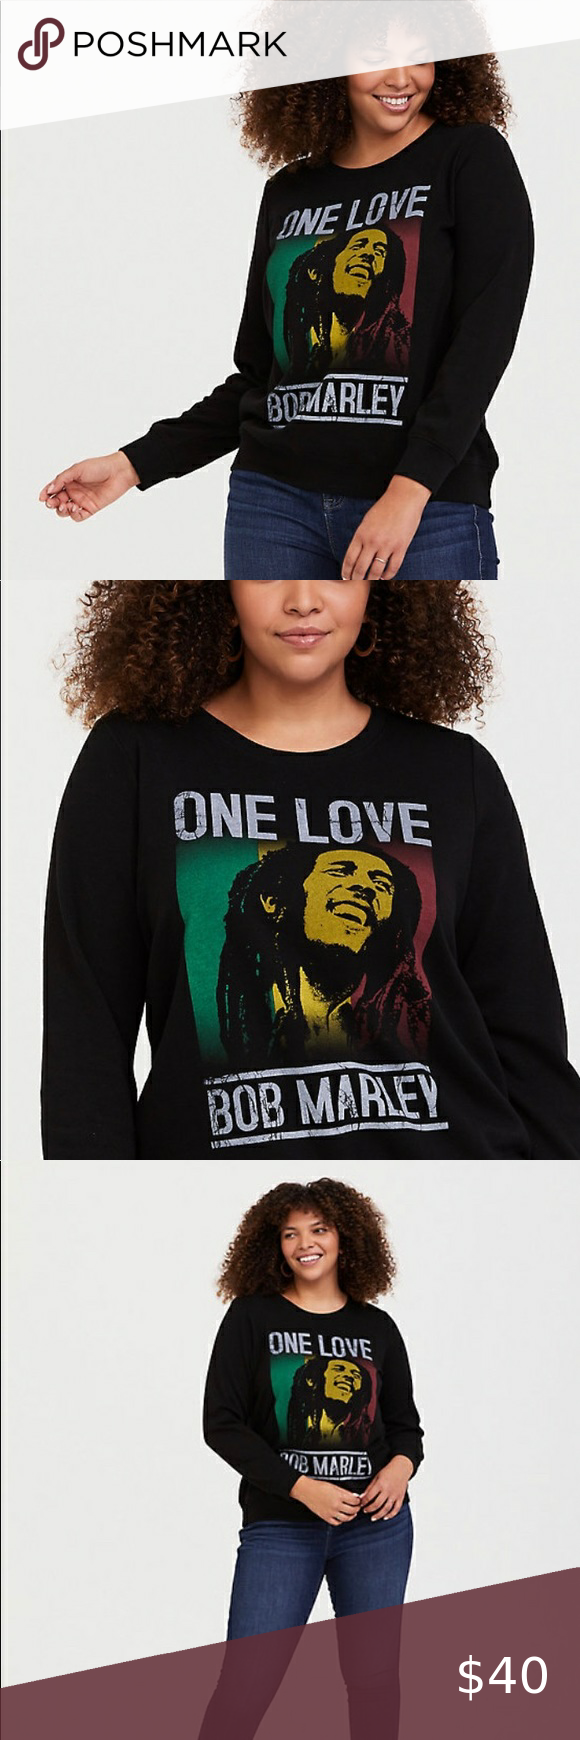 Torrid Bob Marley One Love Pullover Sweatshirt This Soft Vintage Inspired Bob Marley Pullover Sweatshirt Fea Pullover Sweatshirt Sweatshirts Sweatshirt Tops [ 1740 x 580 Pixel ]